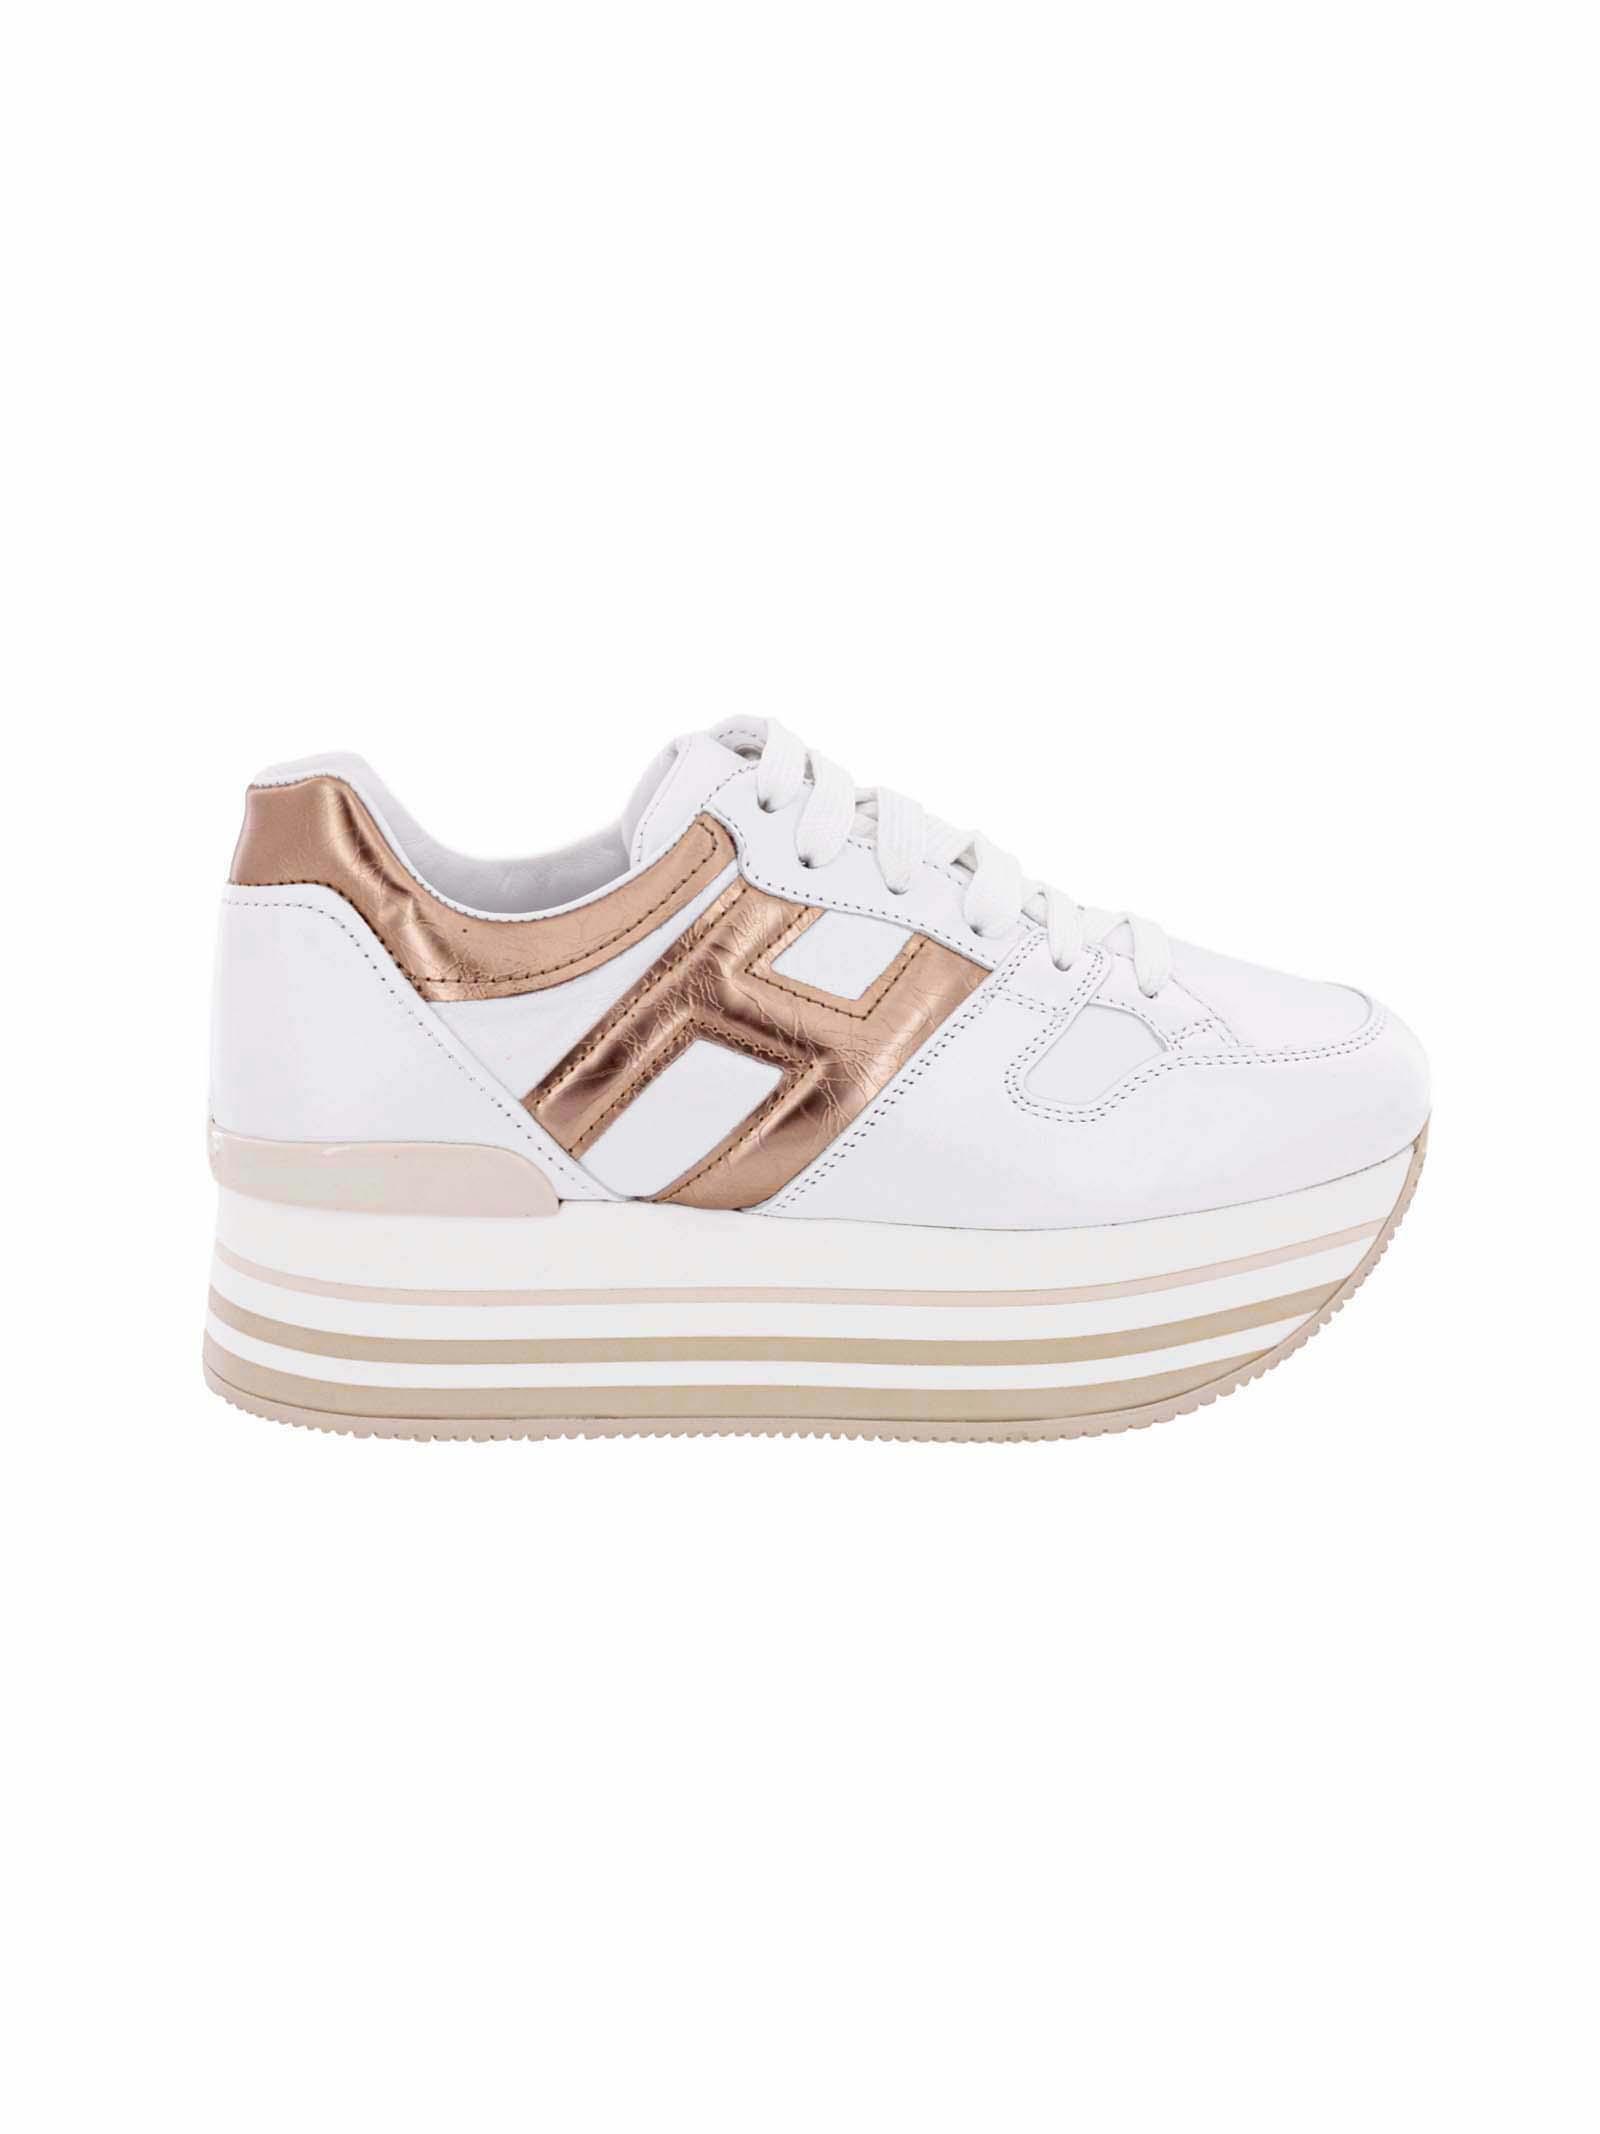 Sneakers Hogan HOGAN | 5032295 | HXW2830T548O6T0989